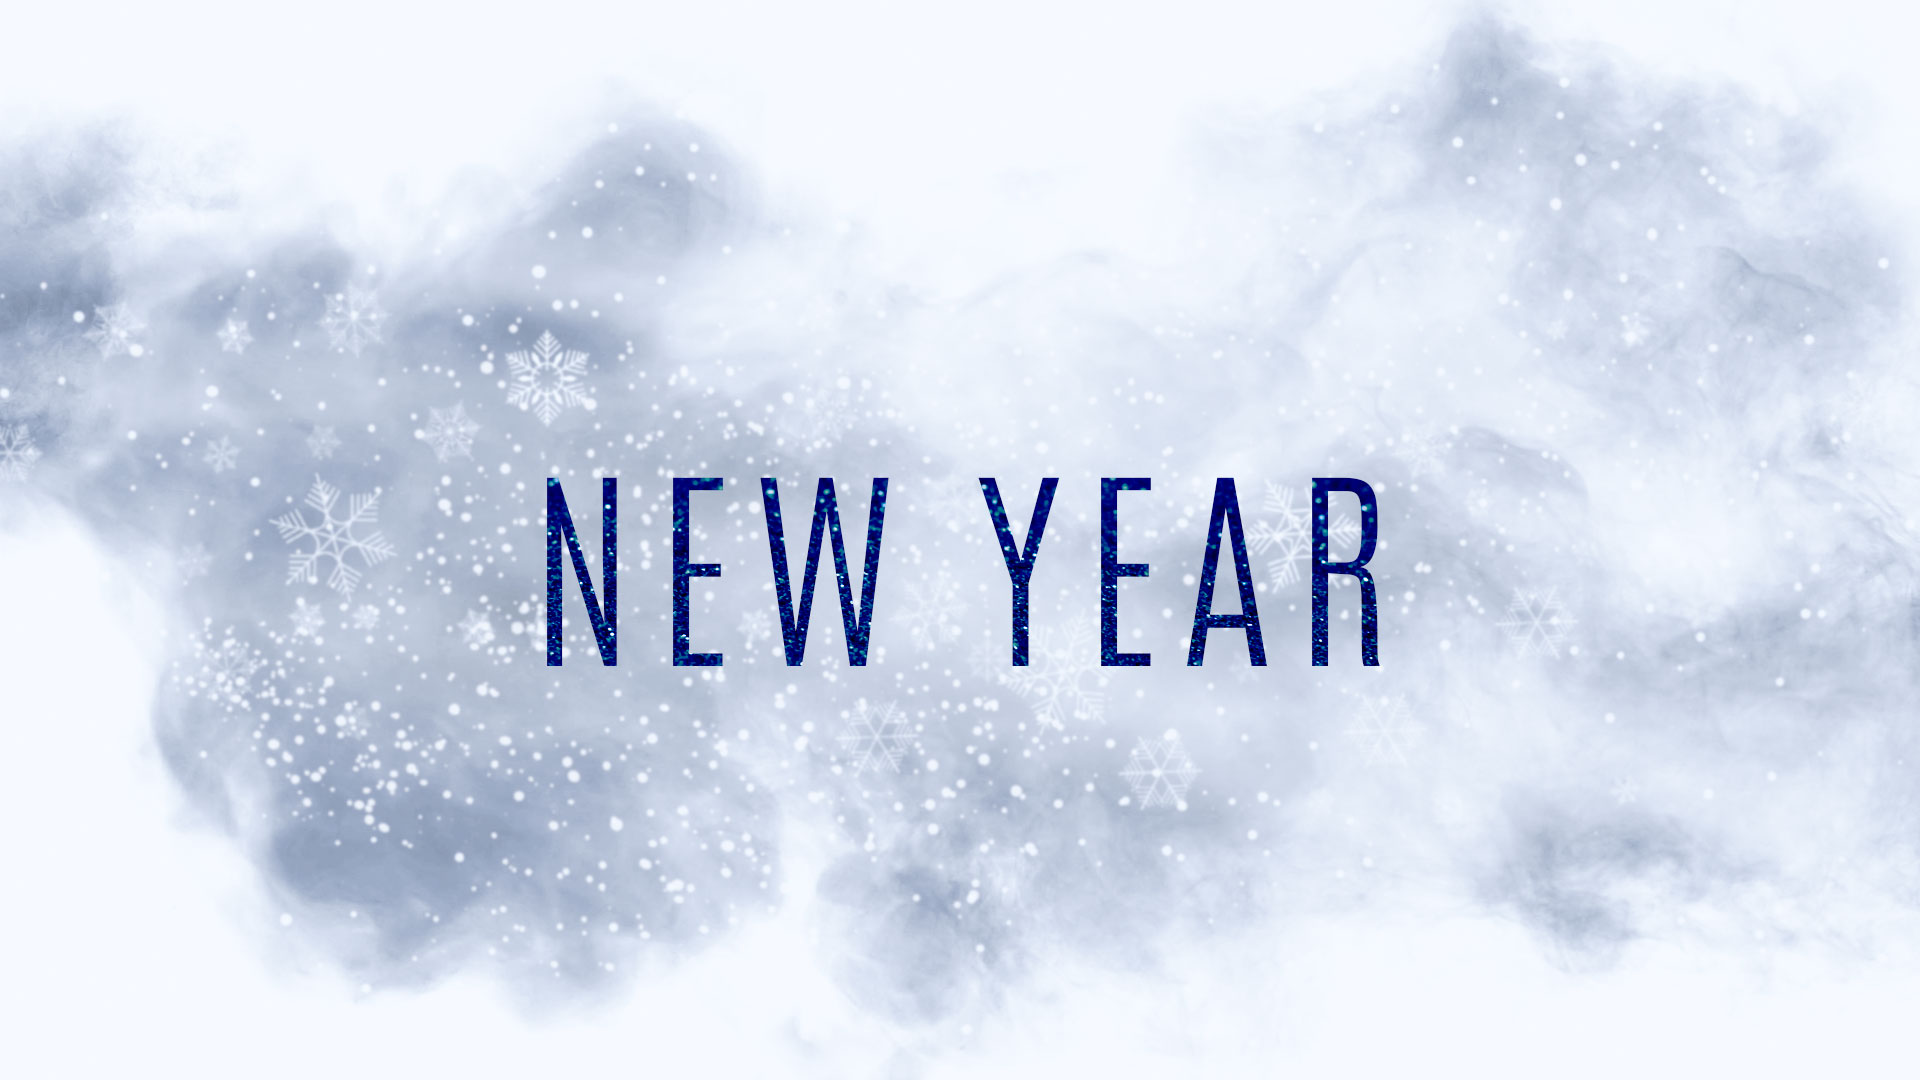 masthead: New Year 2020